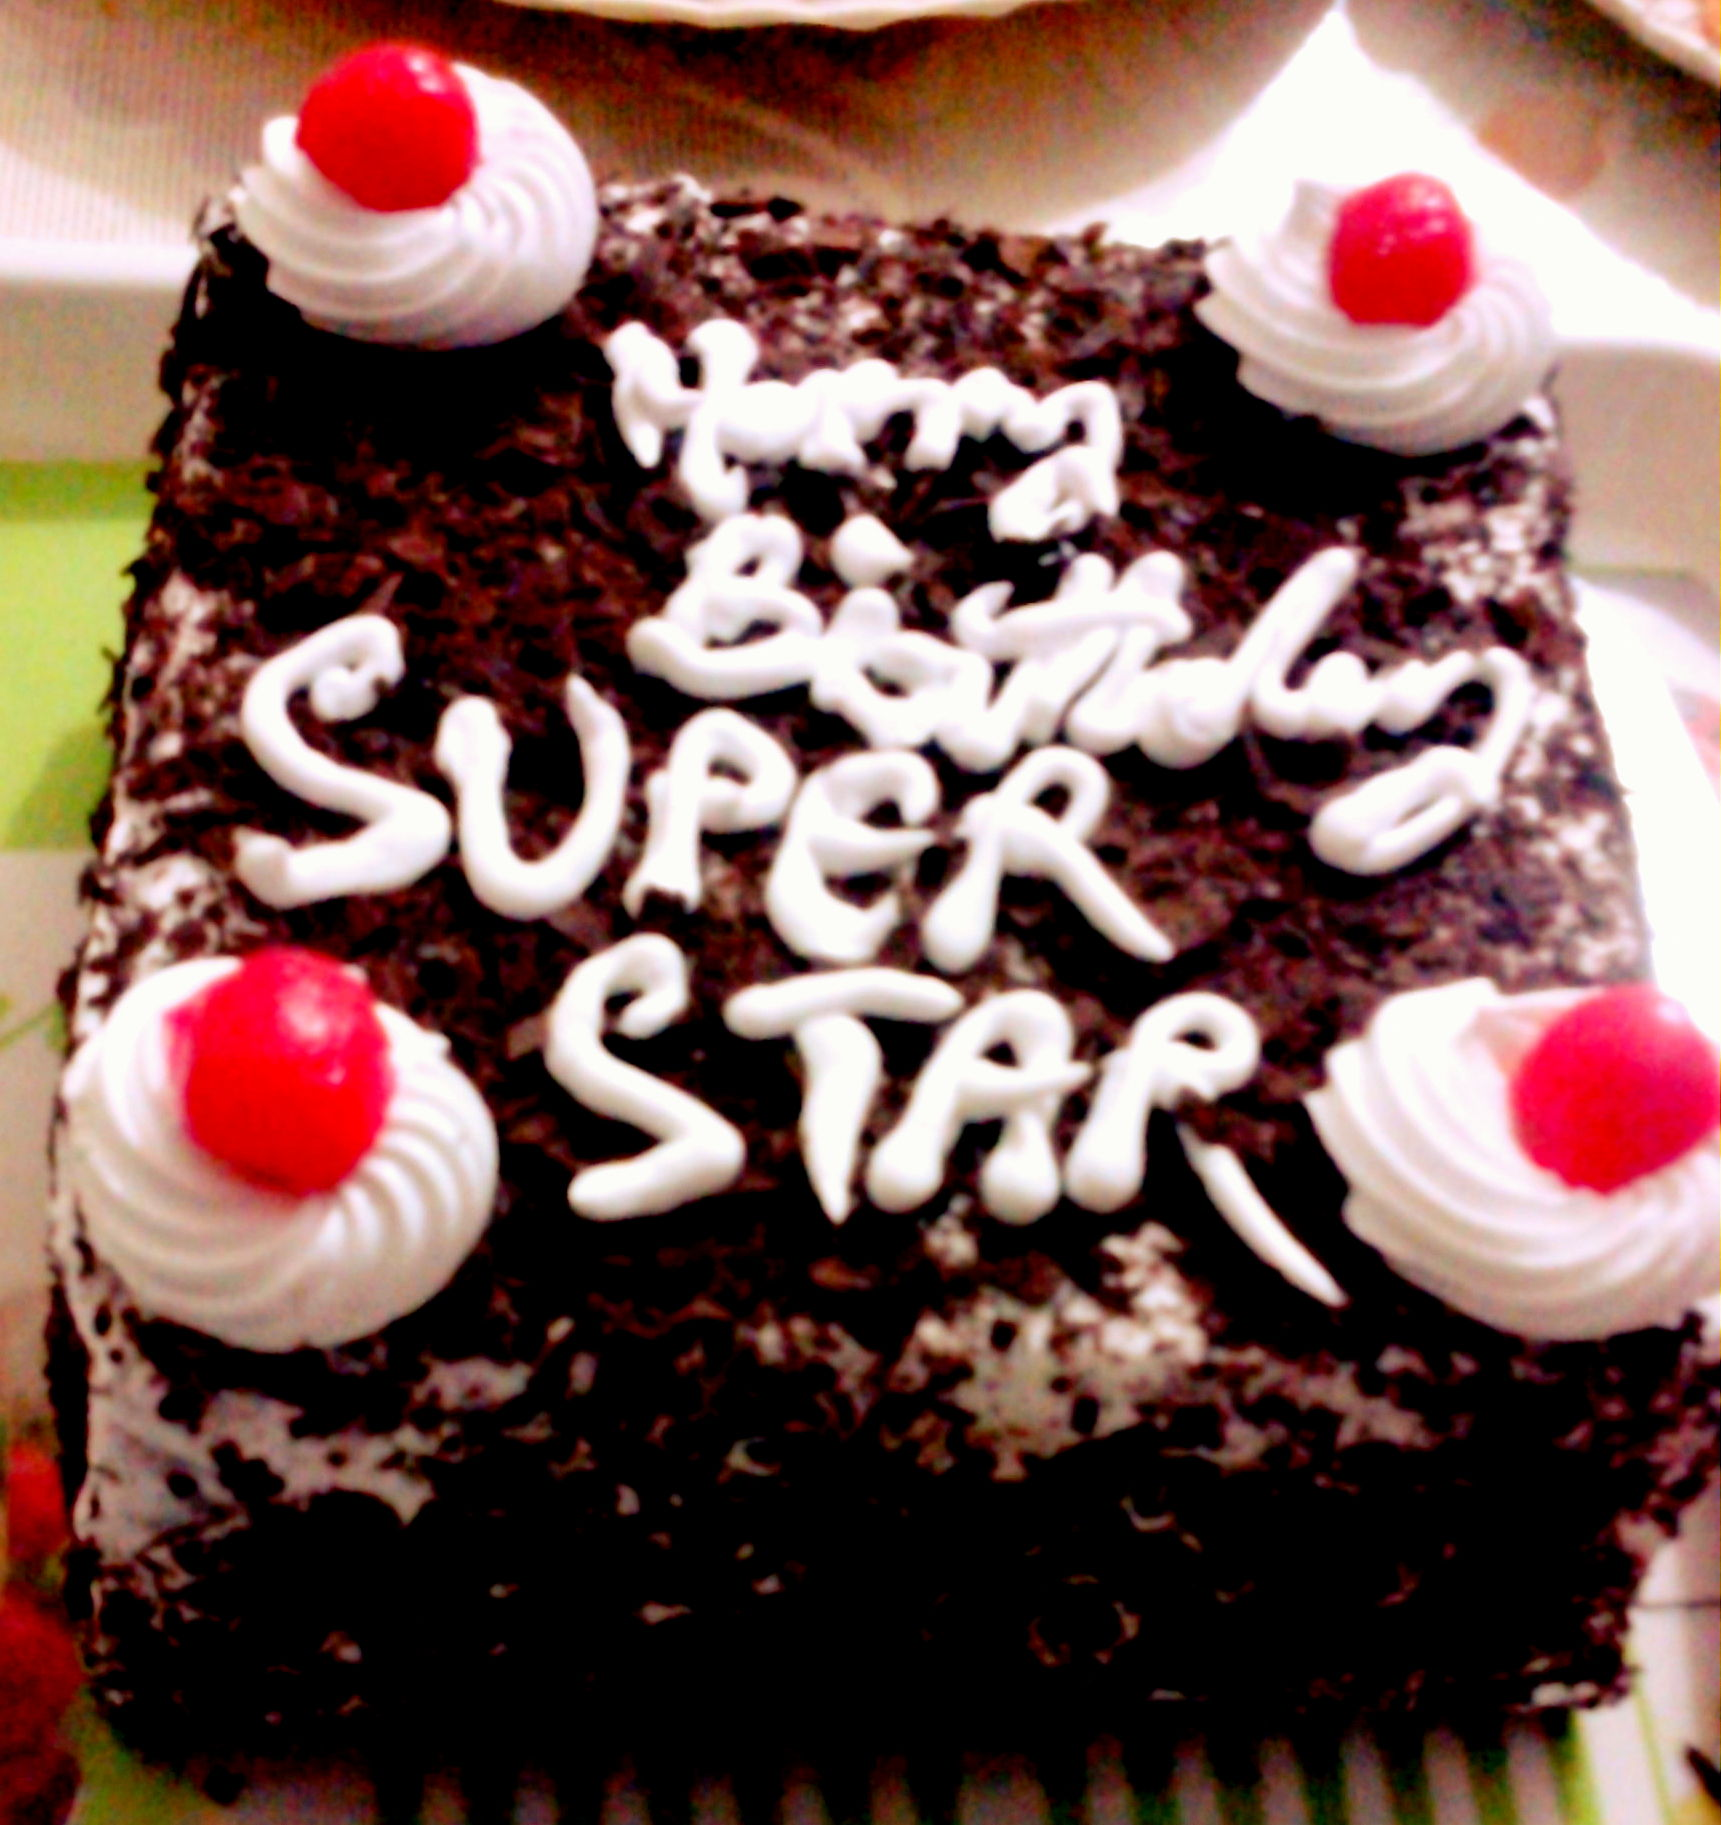 FileThe Birthday Cake Of Superstar 2014 04 01 22 01